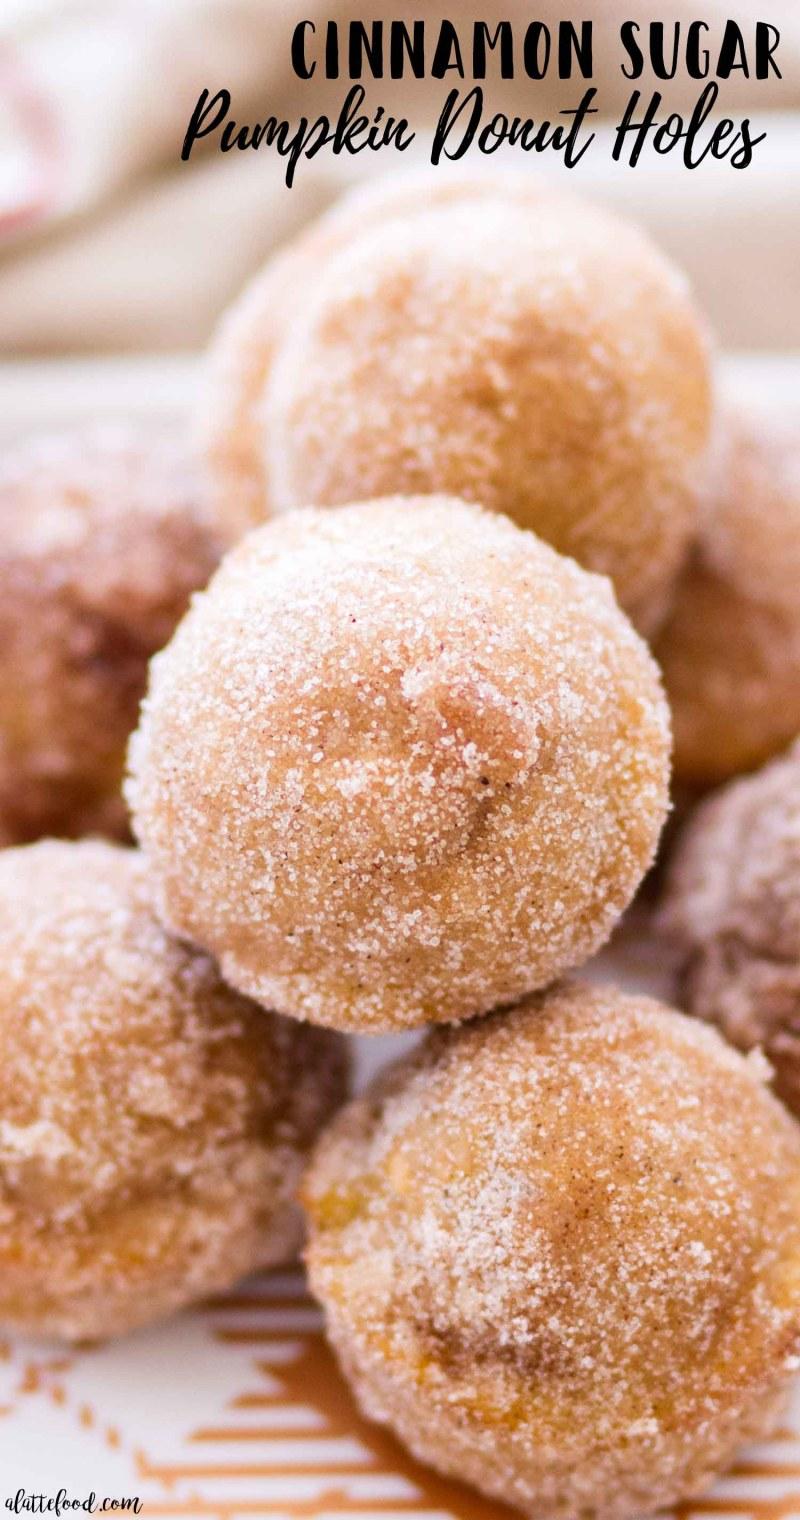 up close photo of cinnamon sugar pumpkin donut holes